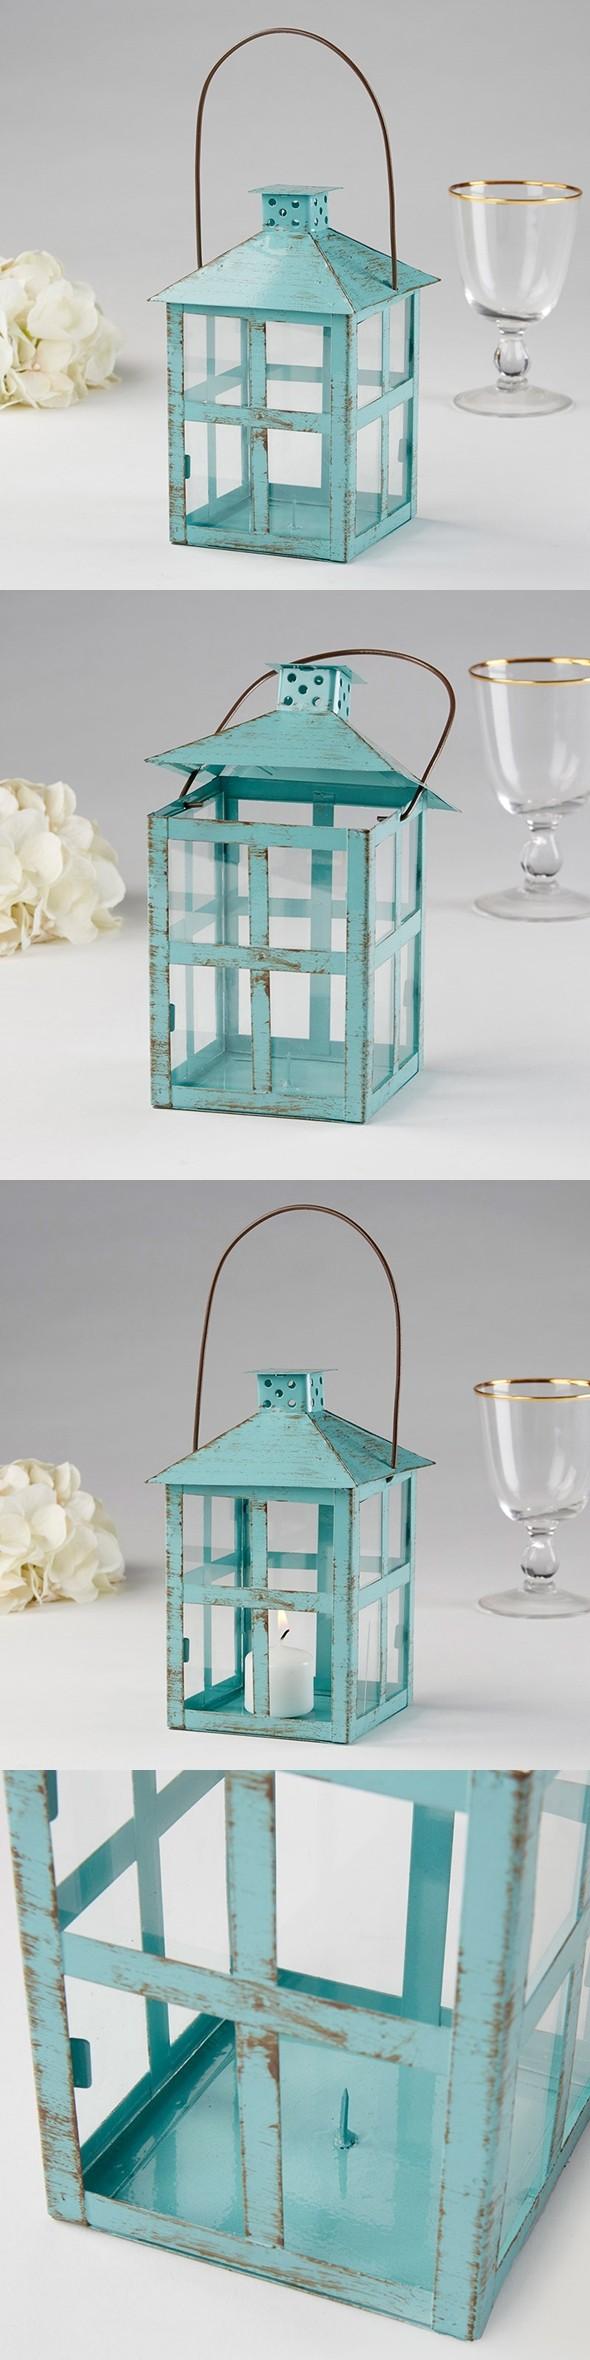 Kate Aspen Vintage-Look Distressed Blue Finish Large Metal Lantern